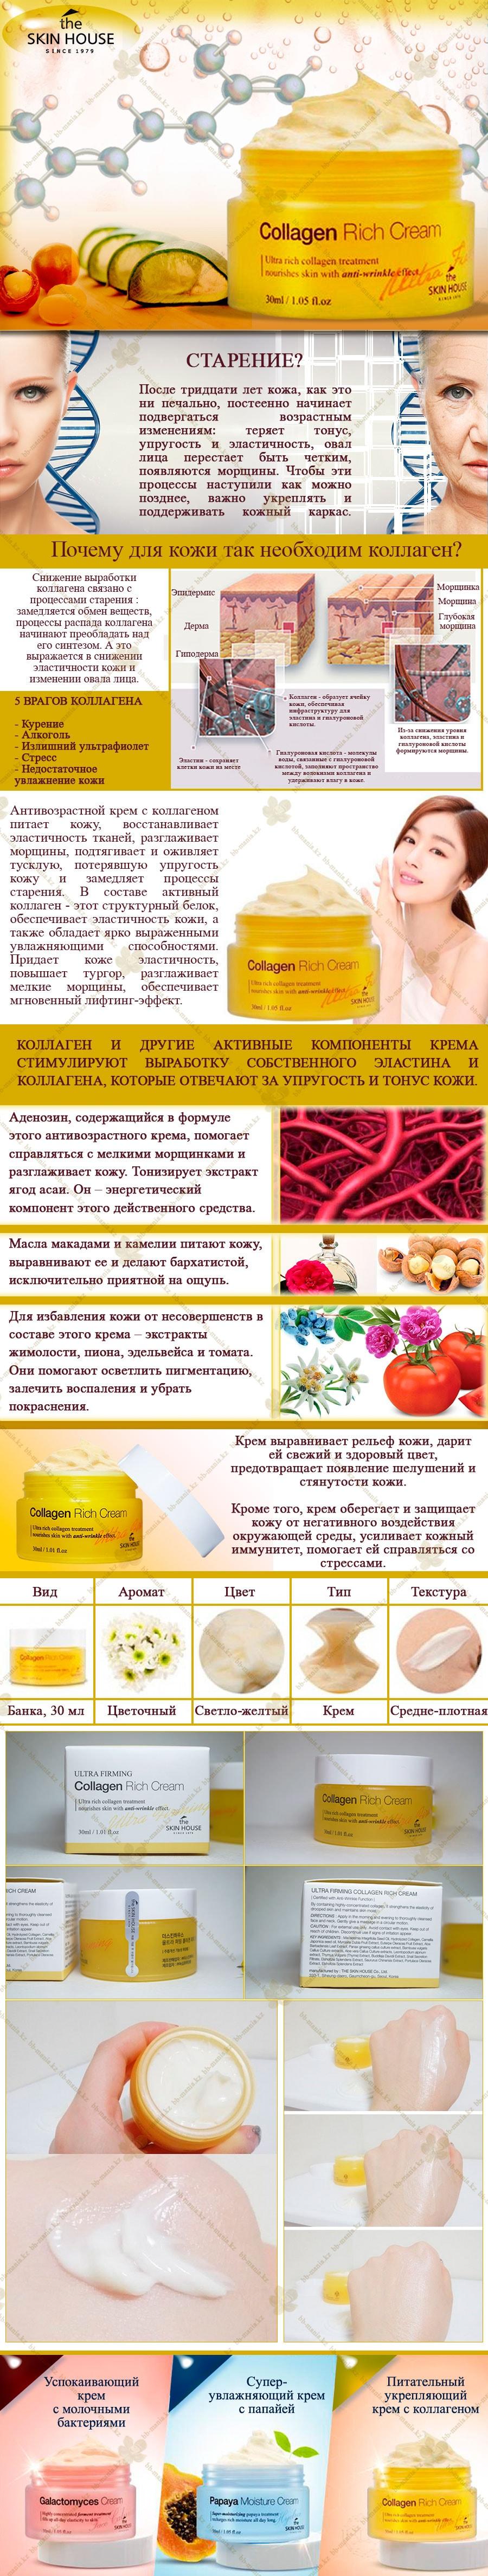 Ultra-Firming-Collagen-Rich-Cream-[The-Skin-House]-min